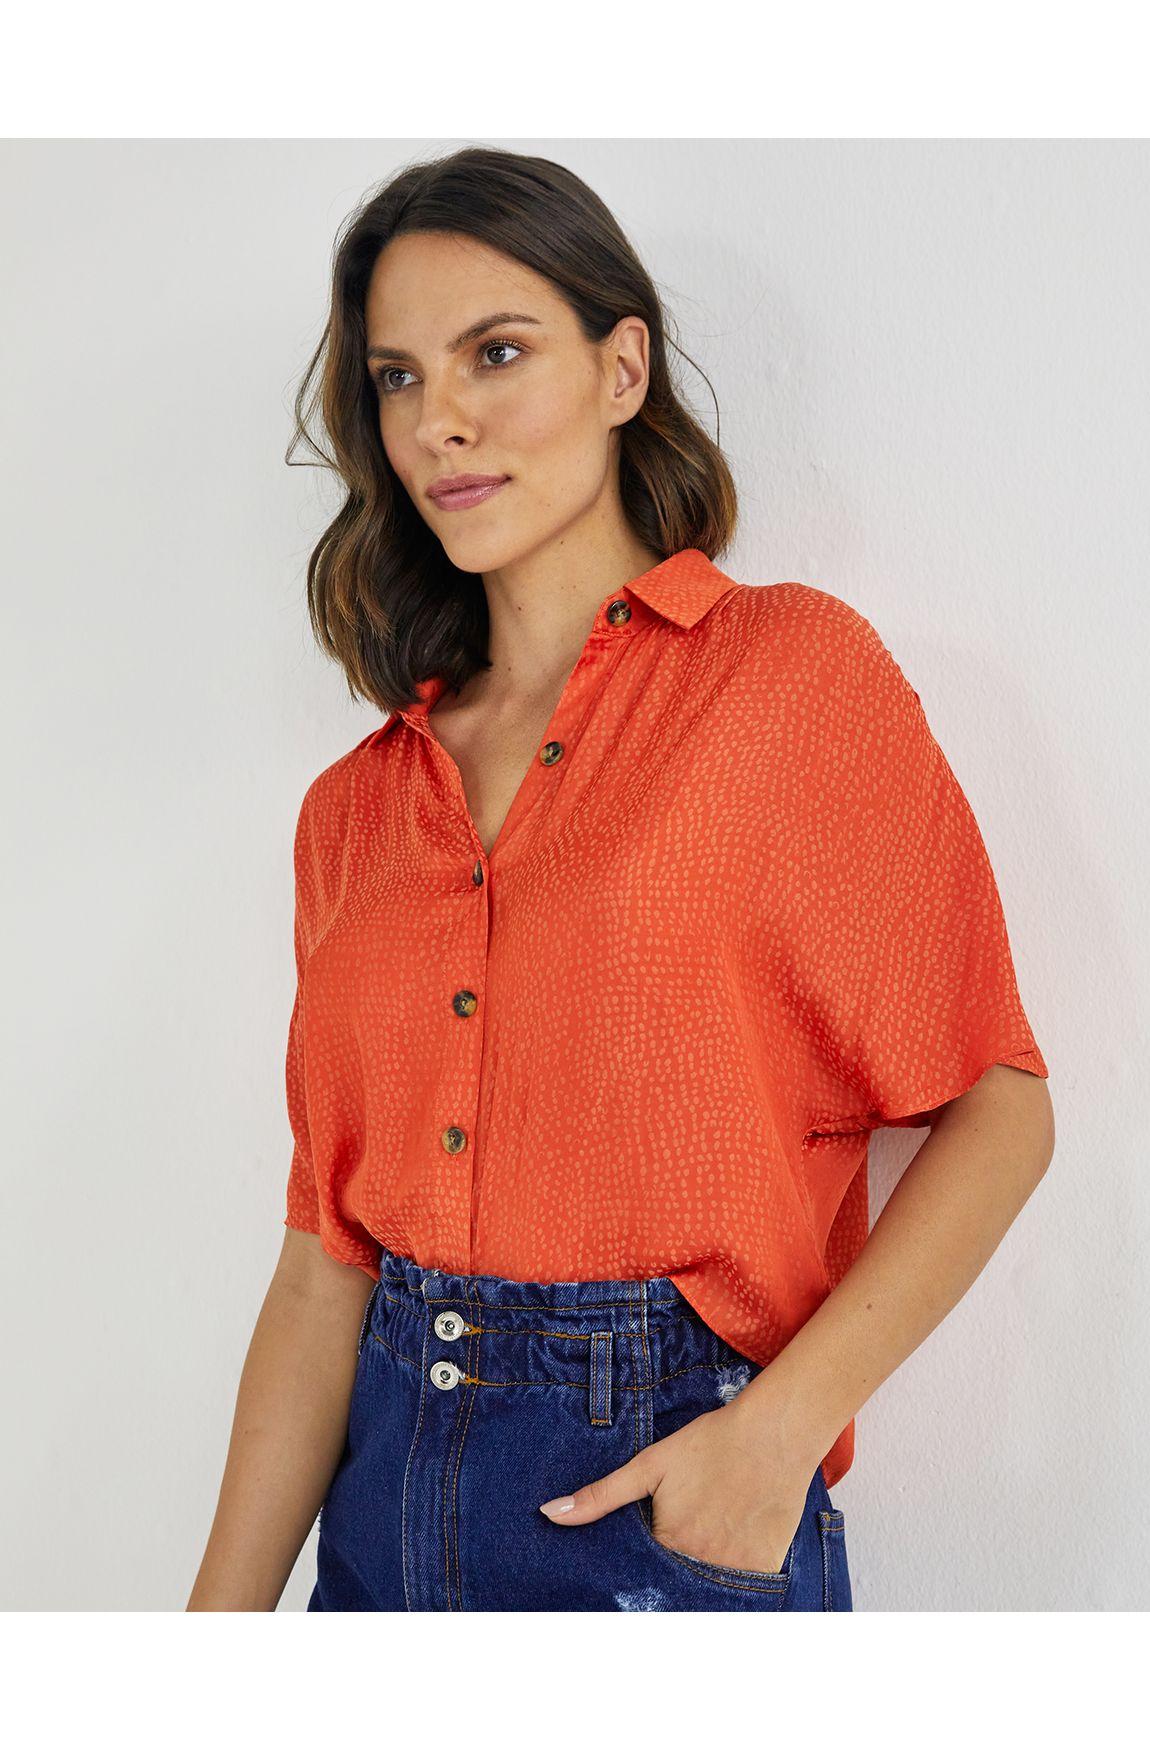 Camisa cetim jacquard laranja